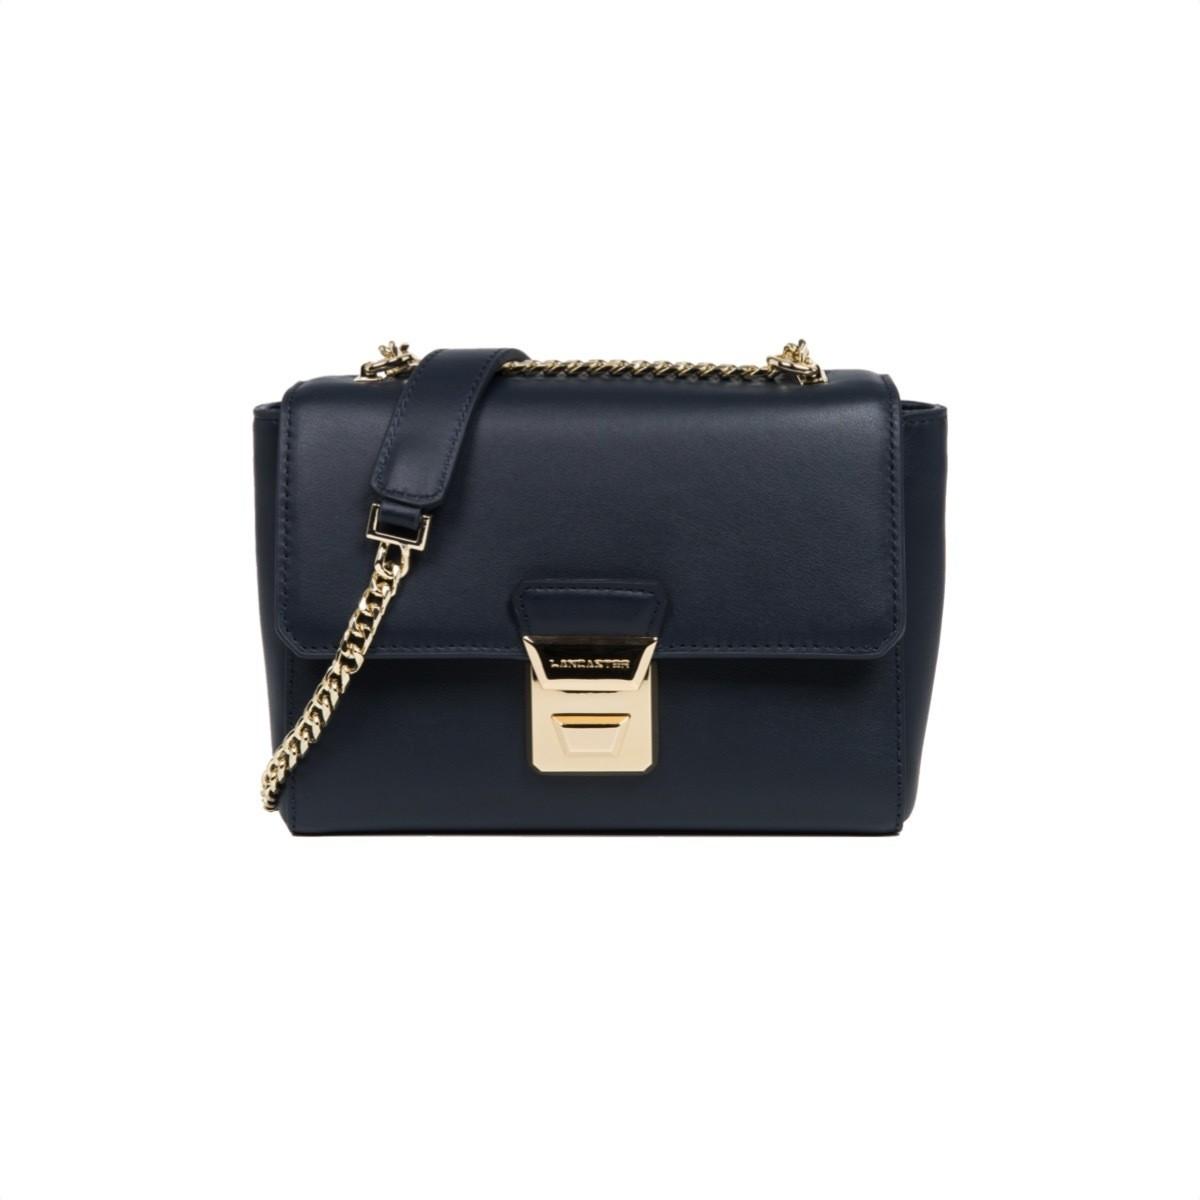 LANCASTER - Small crossbody bag with flap - Bleu Fonce